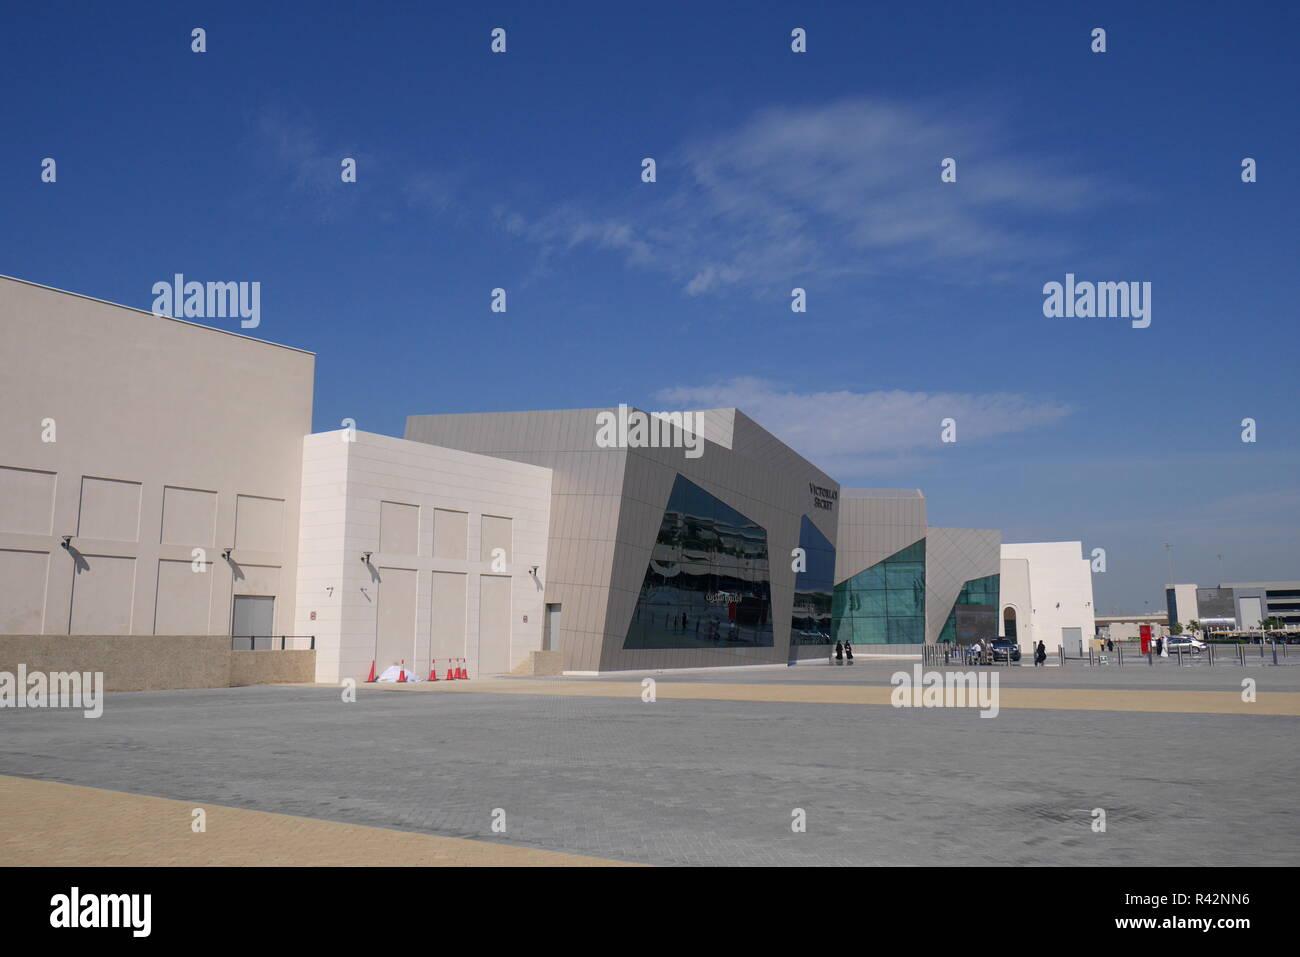 Entrance to the Avenues shopping mall, located on Bahrain Bay, Manama, Kingdom of Bahrain - Stock Image